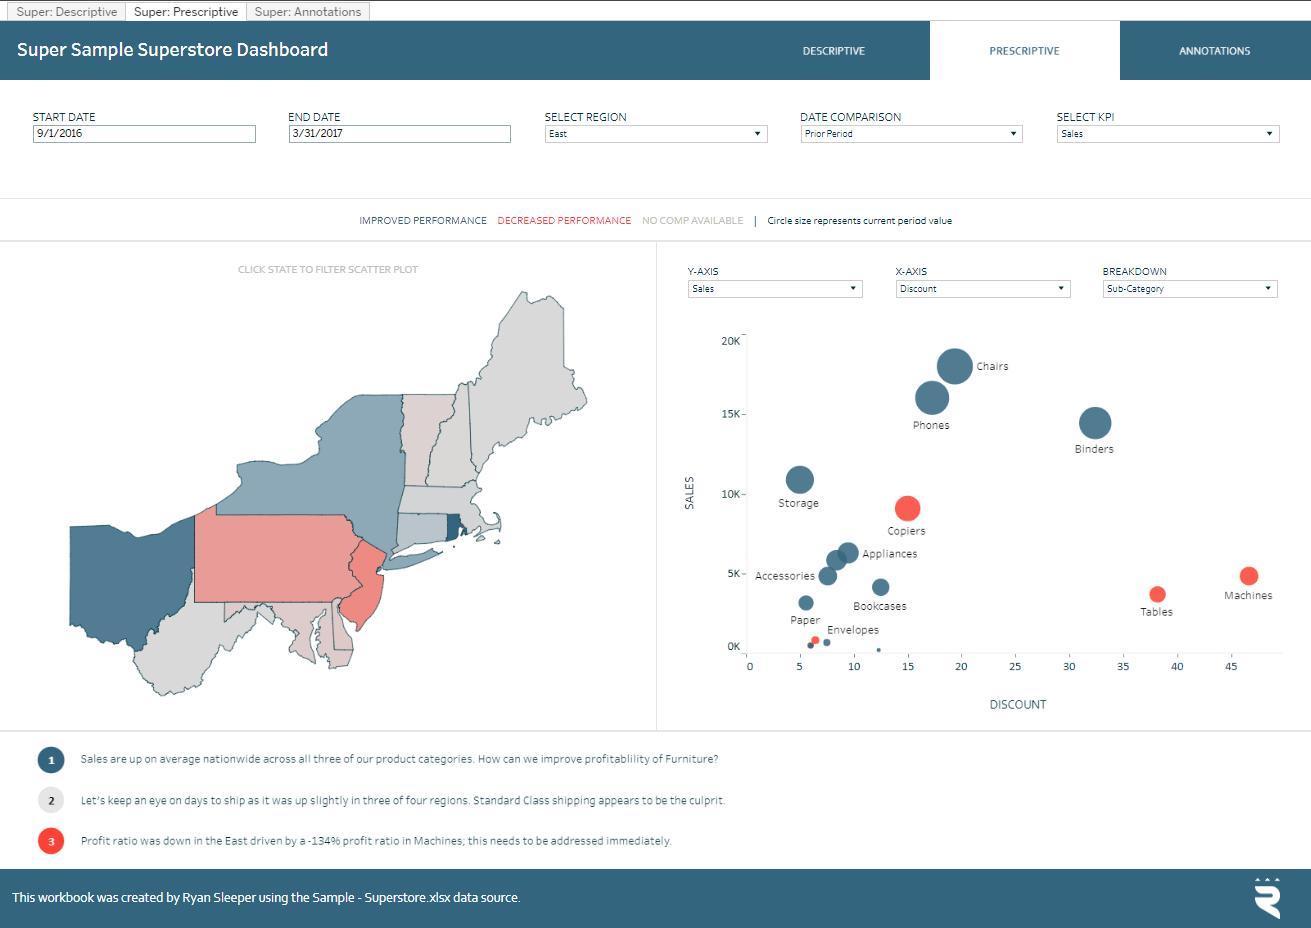 Excel Spreadsheet Data Analysis Throughout Excel Spreadsheets: Data Analysis Made More Powerful With Tableau